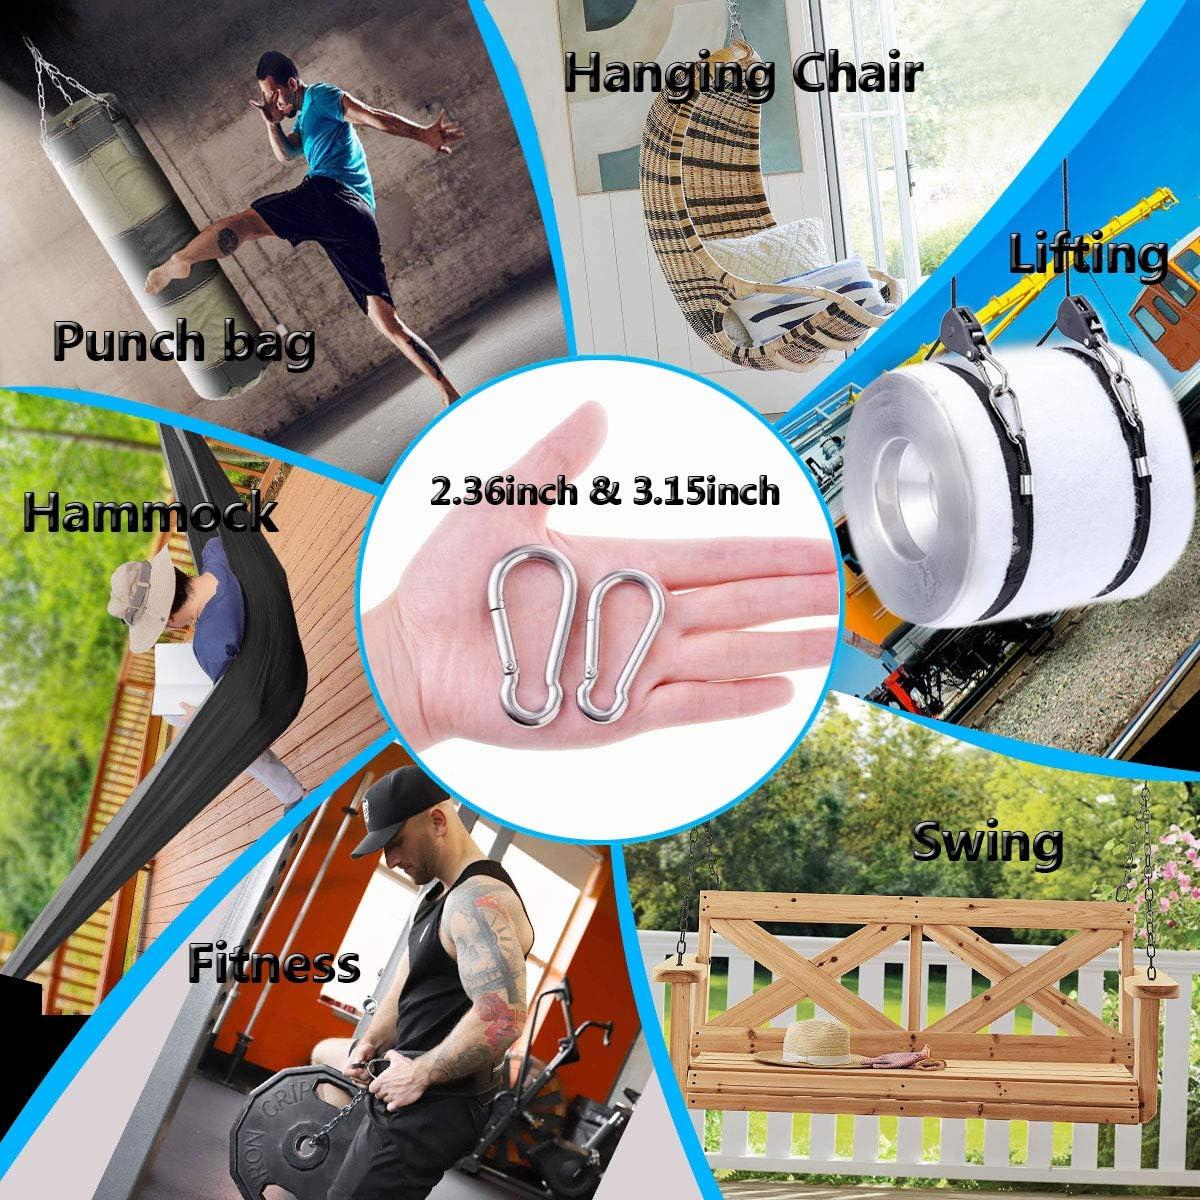 Ekunbuy 304 Stainless Steel Spring Snap Hooks Spring Clips Keychain Link Buckle Rope Connector for Camping Hiking Swing Gym Hammock Carabiner Clips